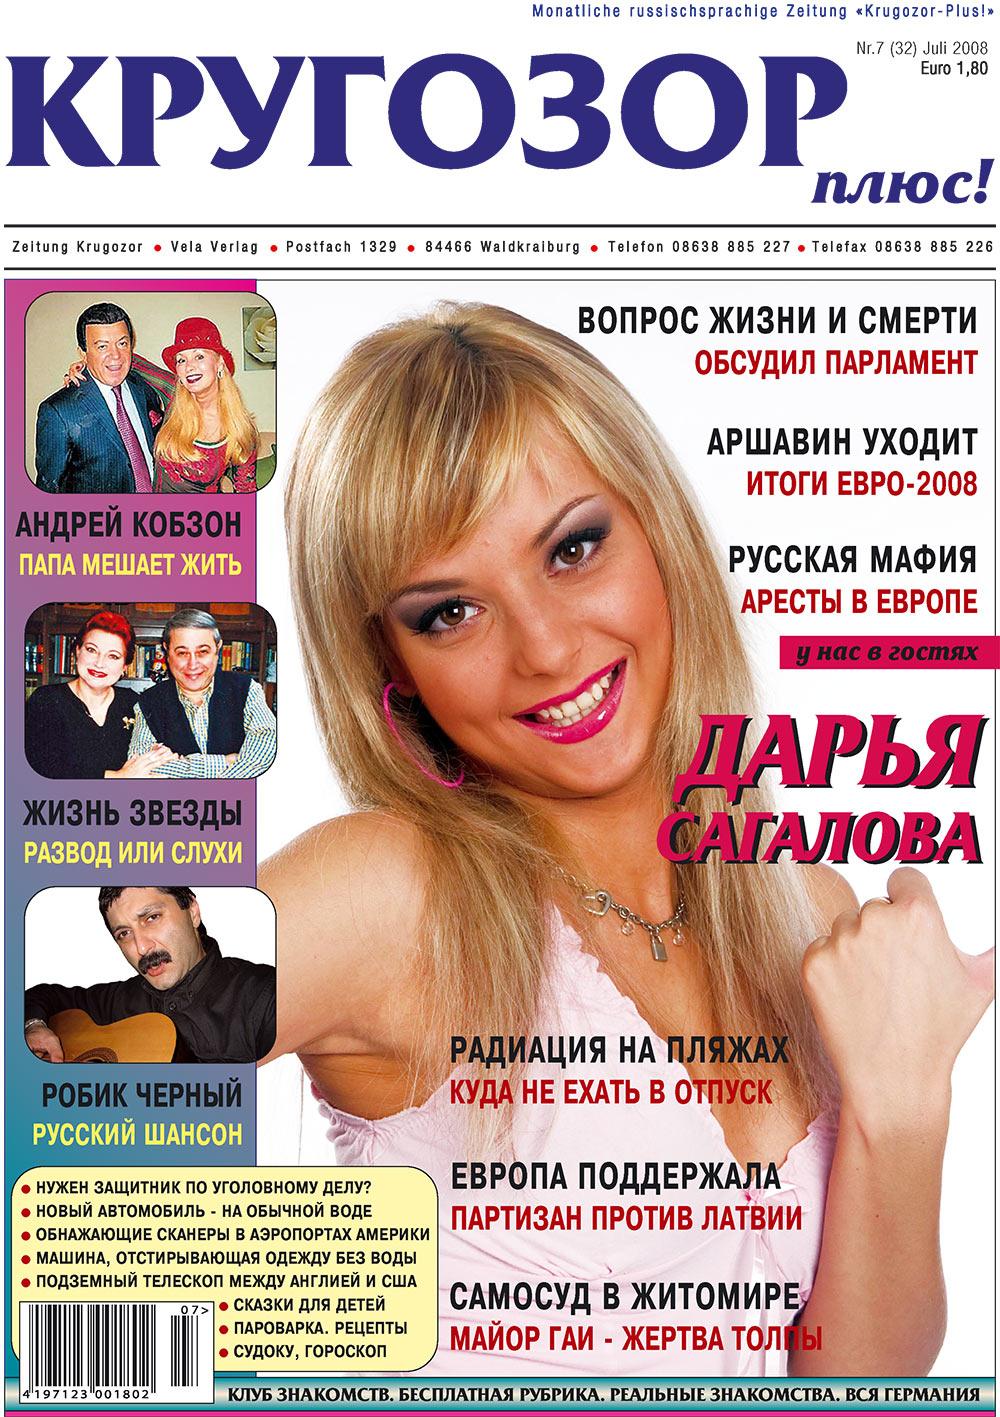 Кругозор плюс! (газета). 2008 год, номер 7, стр. 1